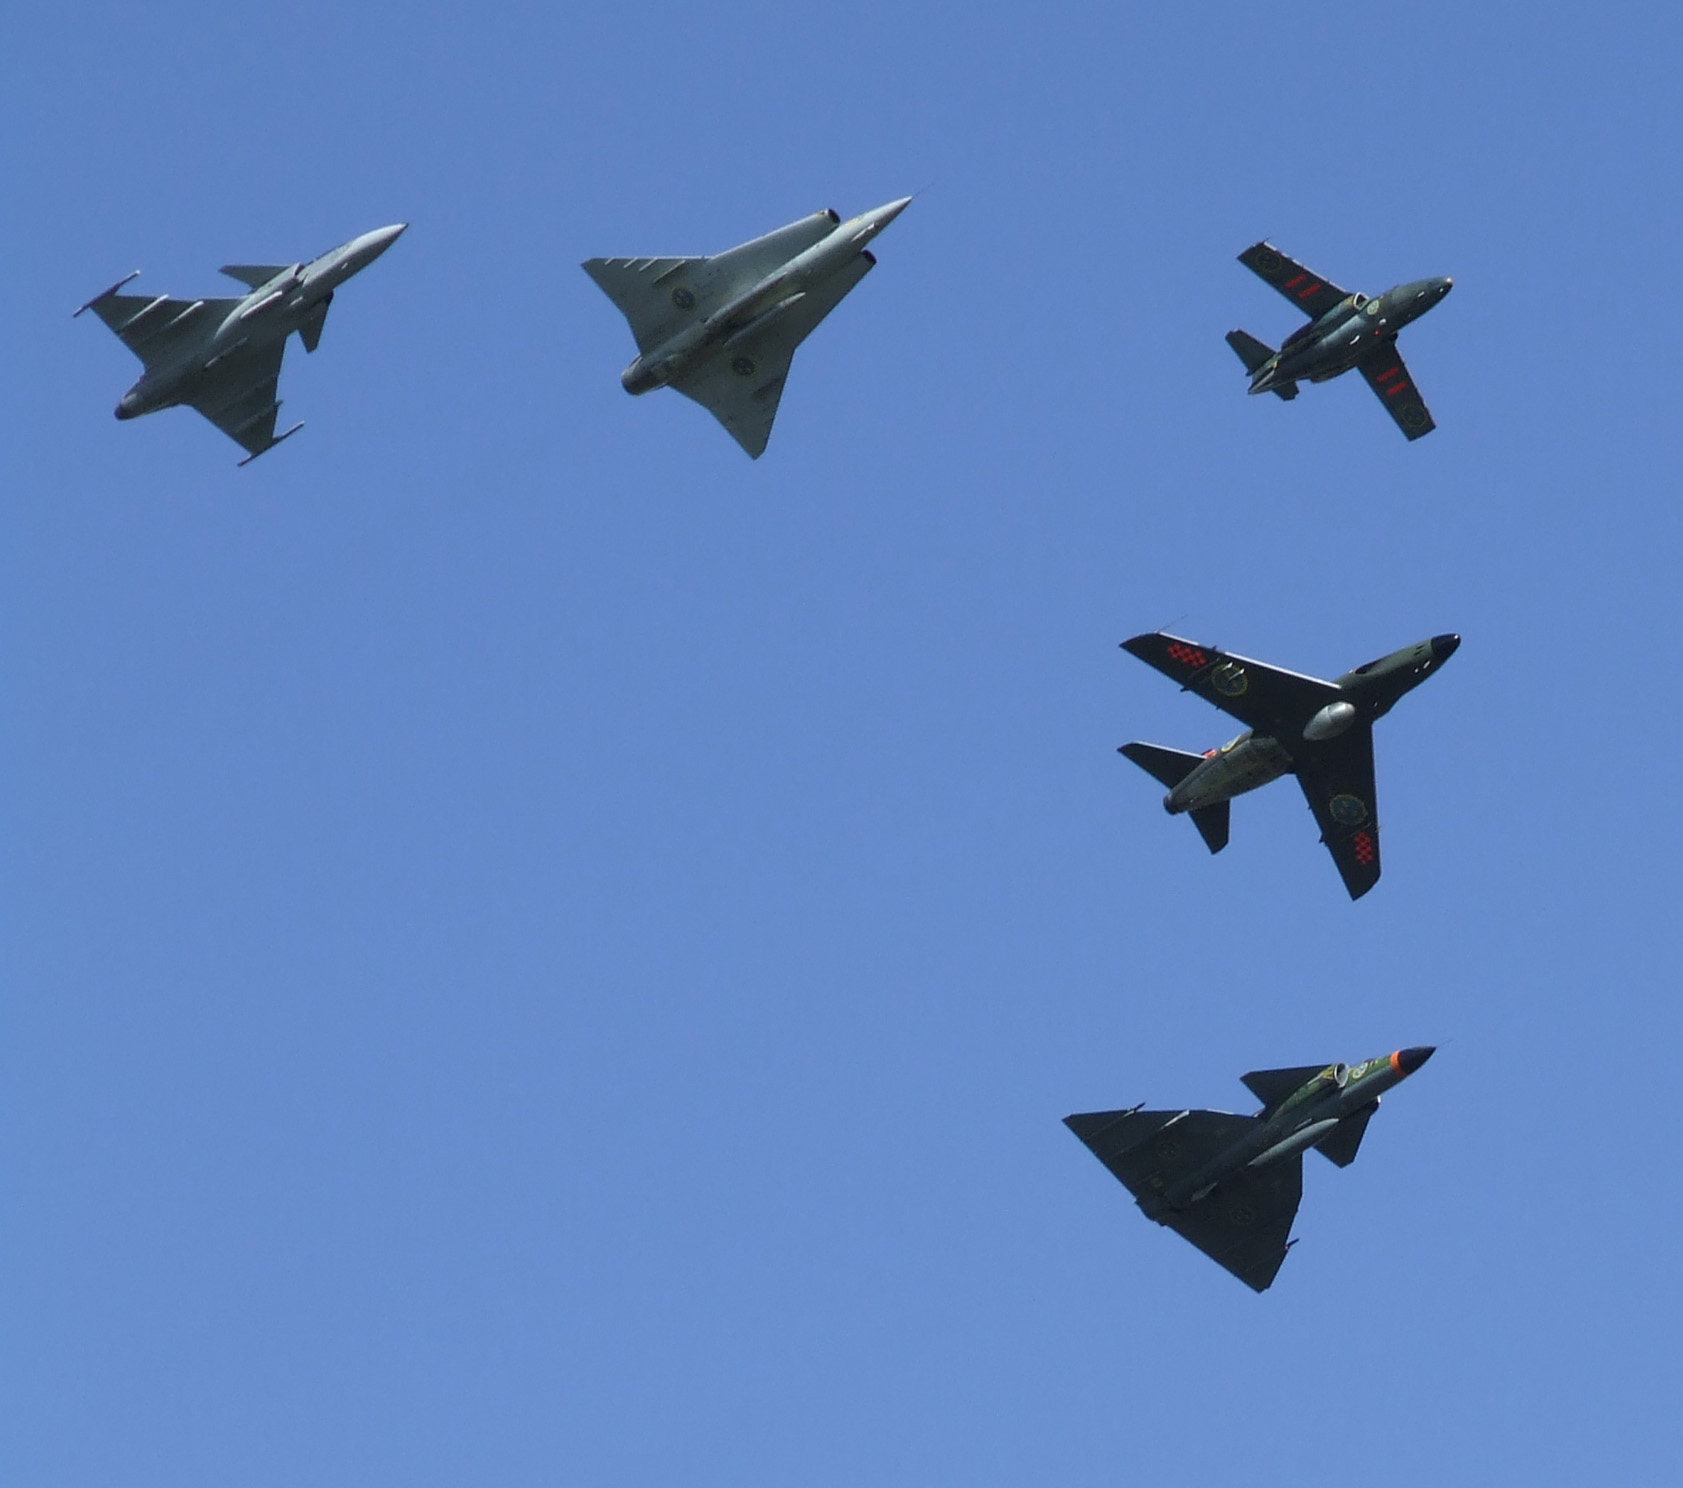 Saab_Military_Aircraft.jpg